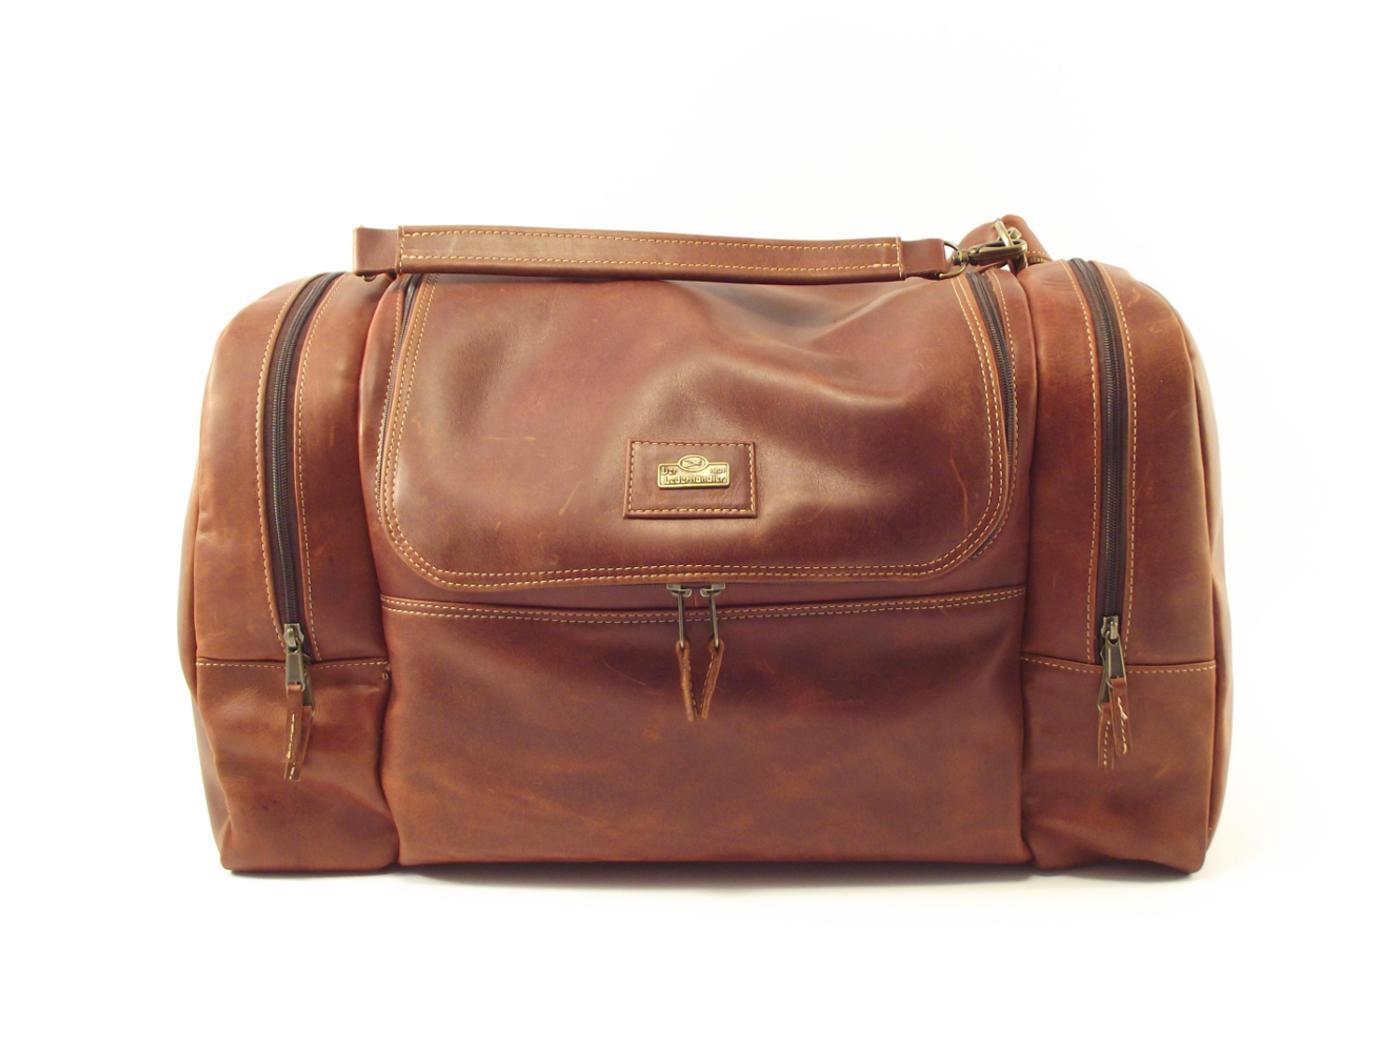 6e015813940 Travel Escape HP7270 - leather duffle bag men by Der Lederhandler